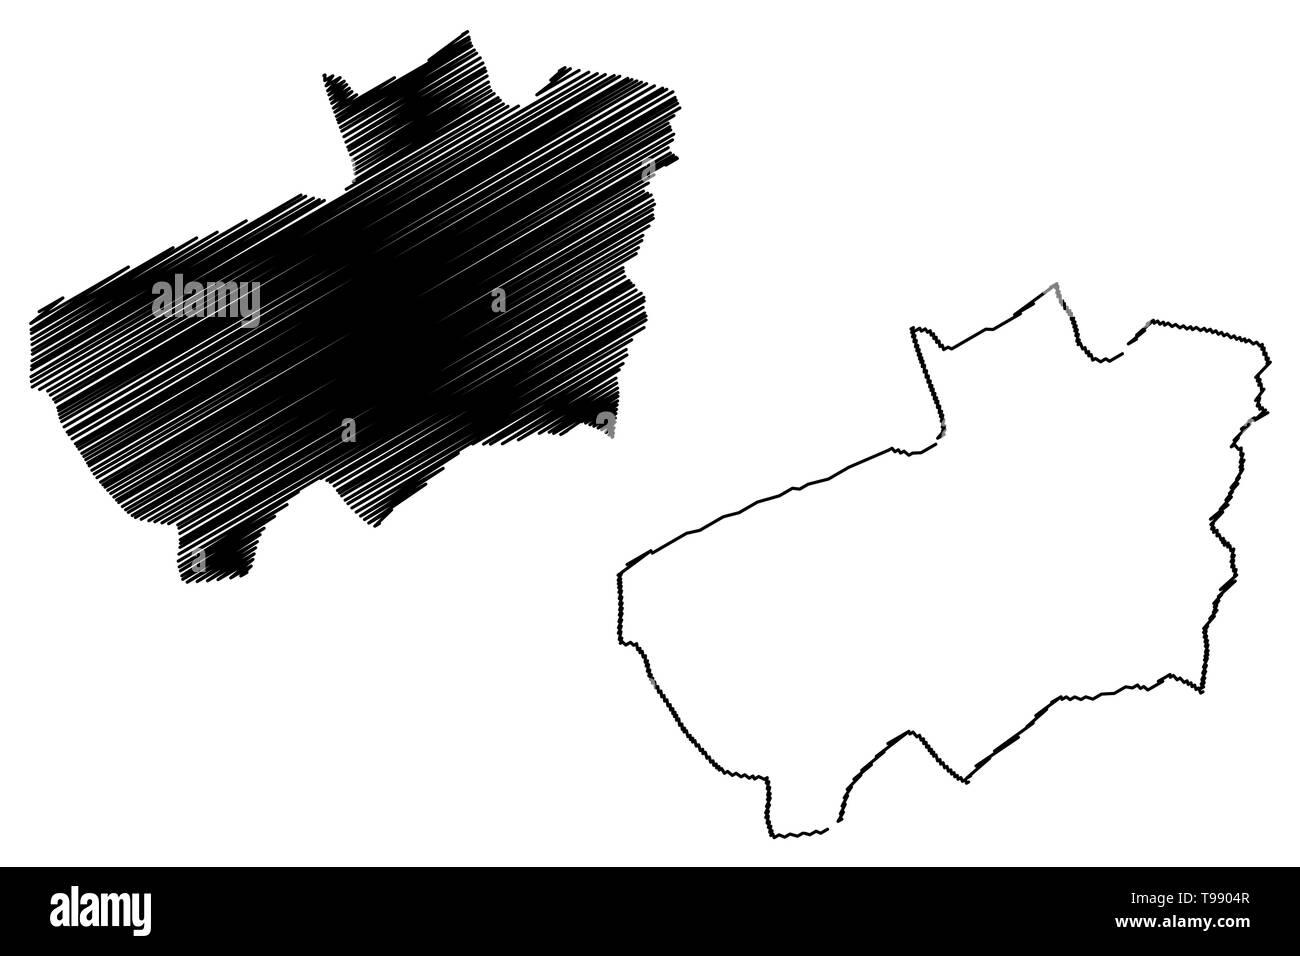 Souk Ahras Province (Provinces of Algeria, Peoples Democratic Republic of Algeria) map vector illustration, scribble sketch Souk Ahras map - Stock Image